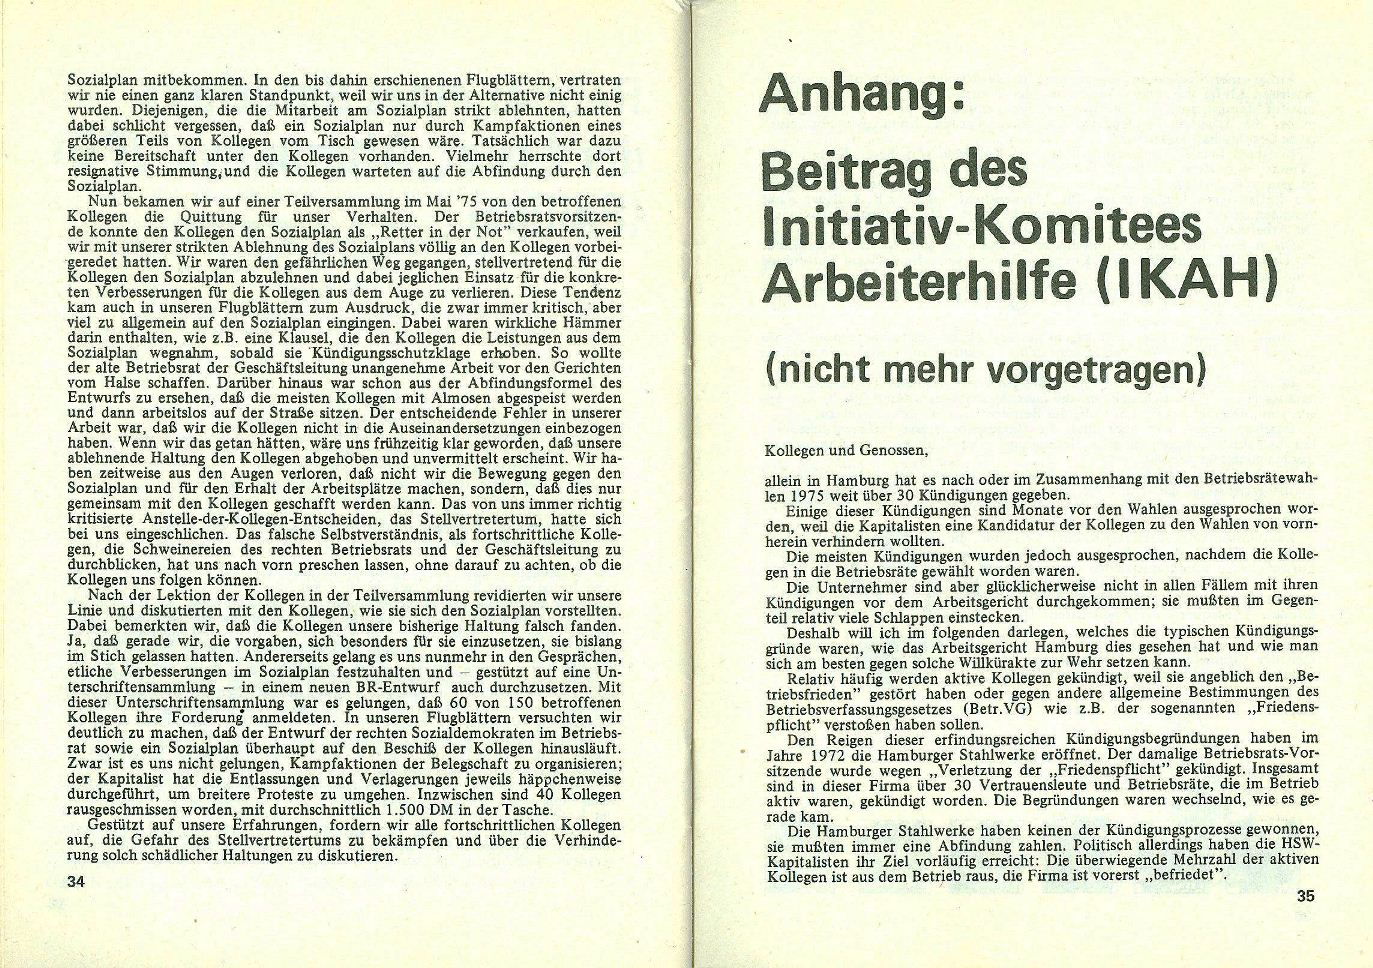 Betriebsraeteveranstaltung_1975_018